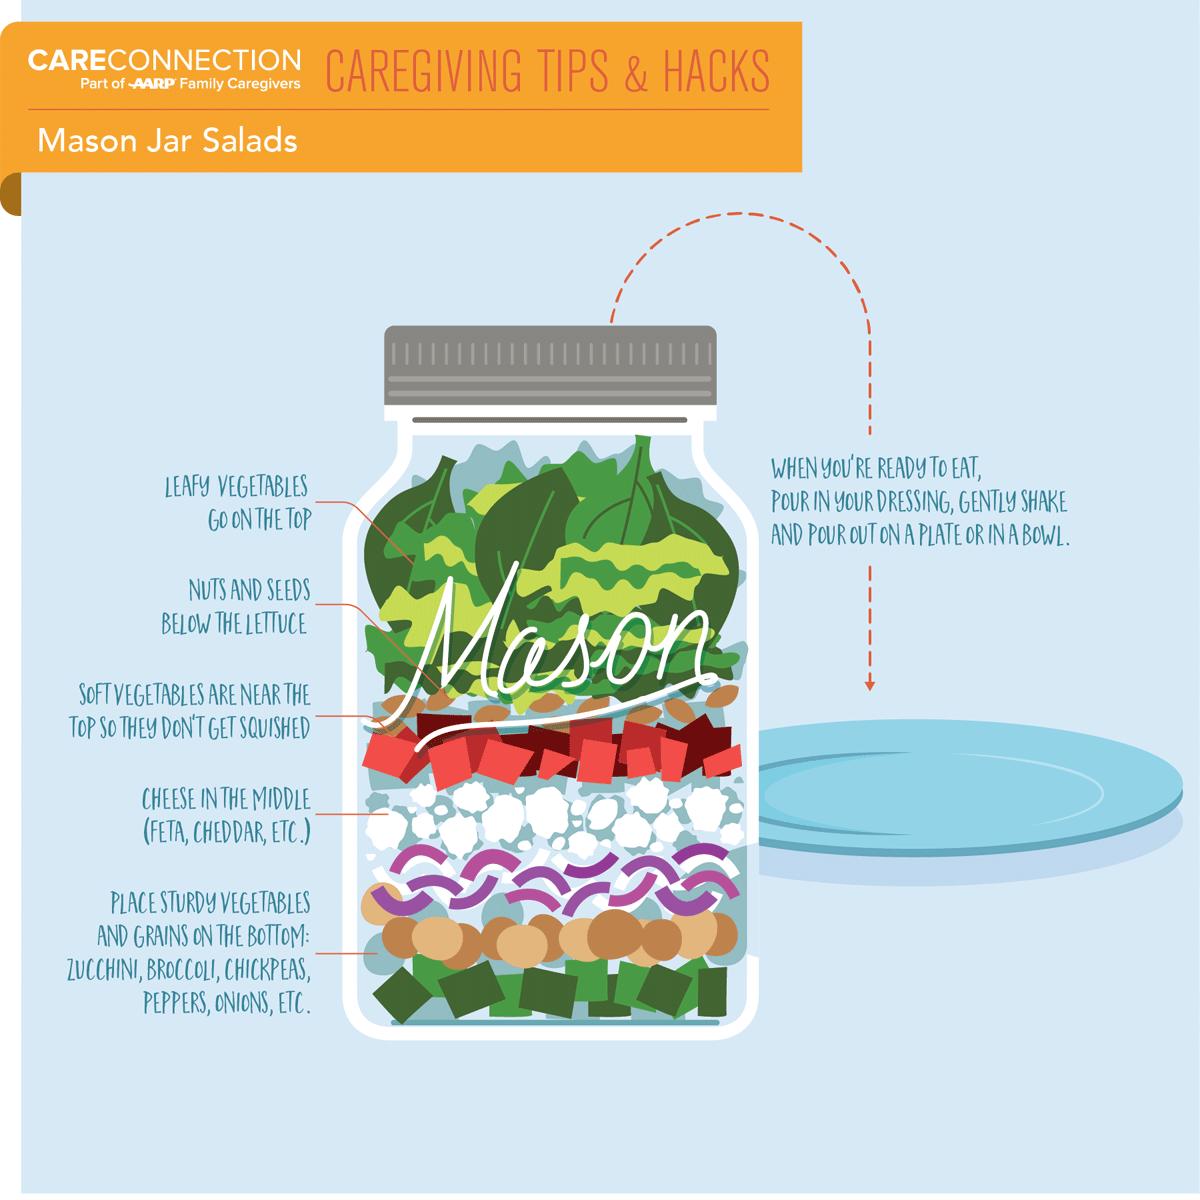 Store salad ingredients in a mason jar